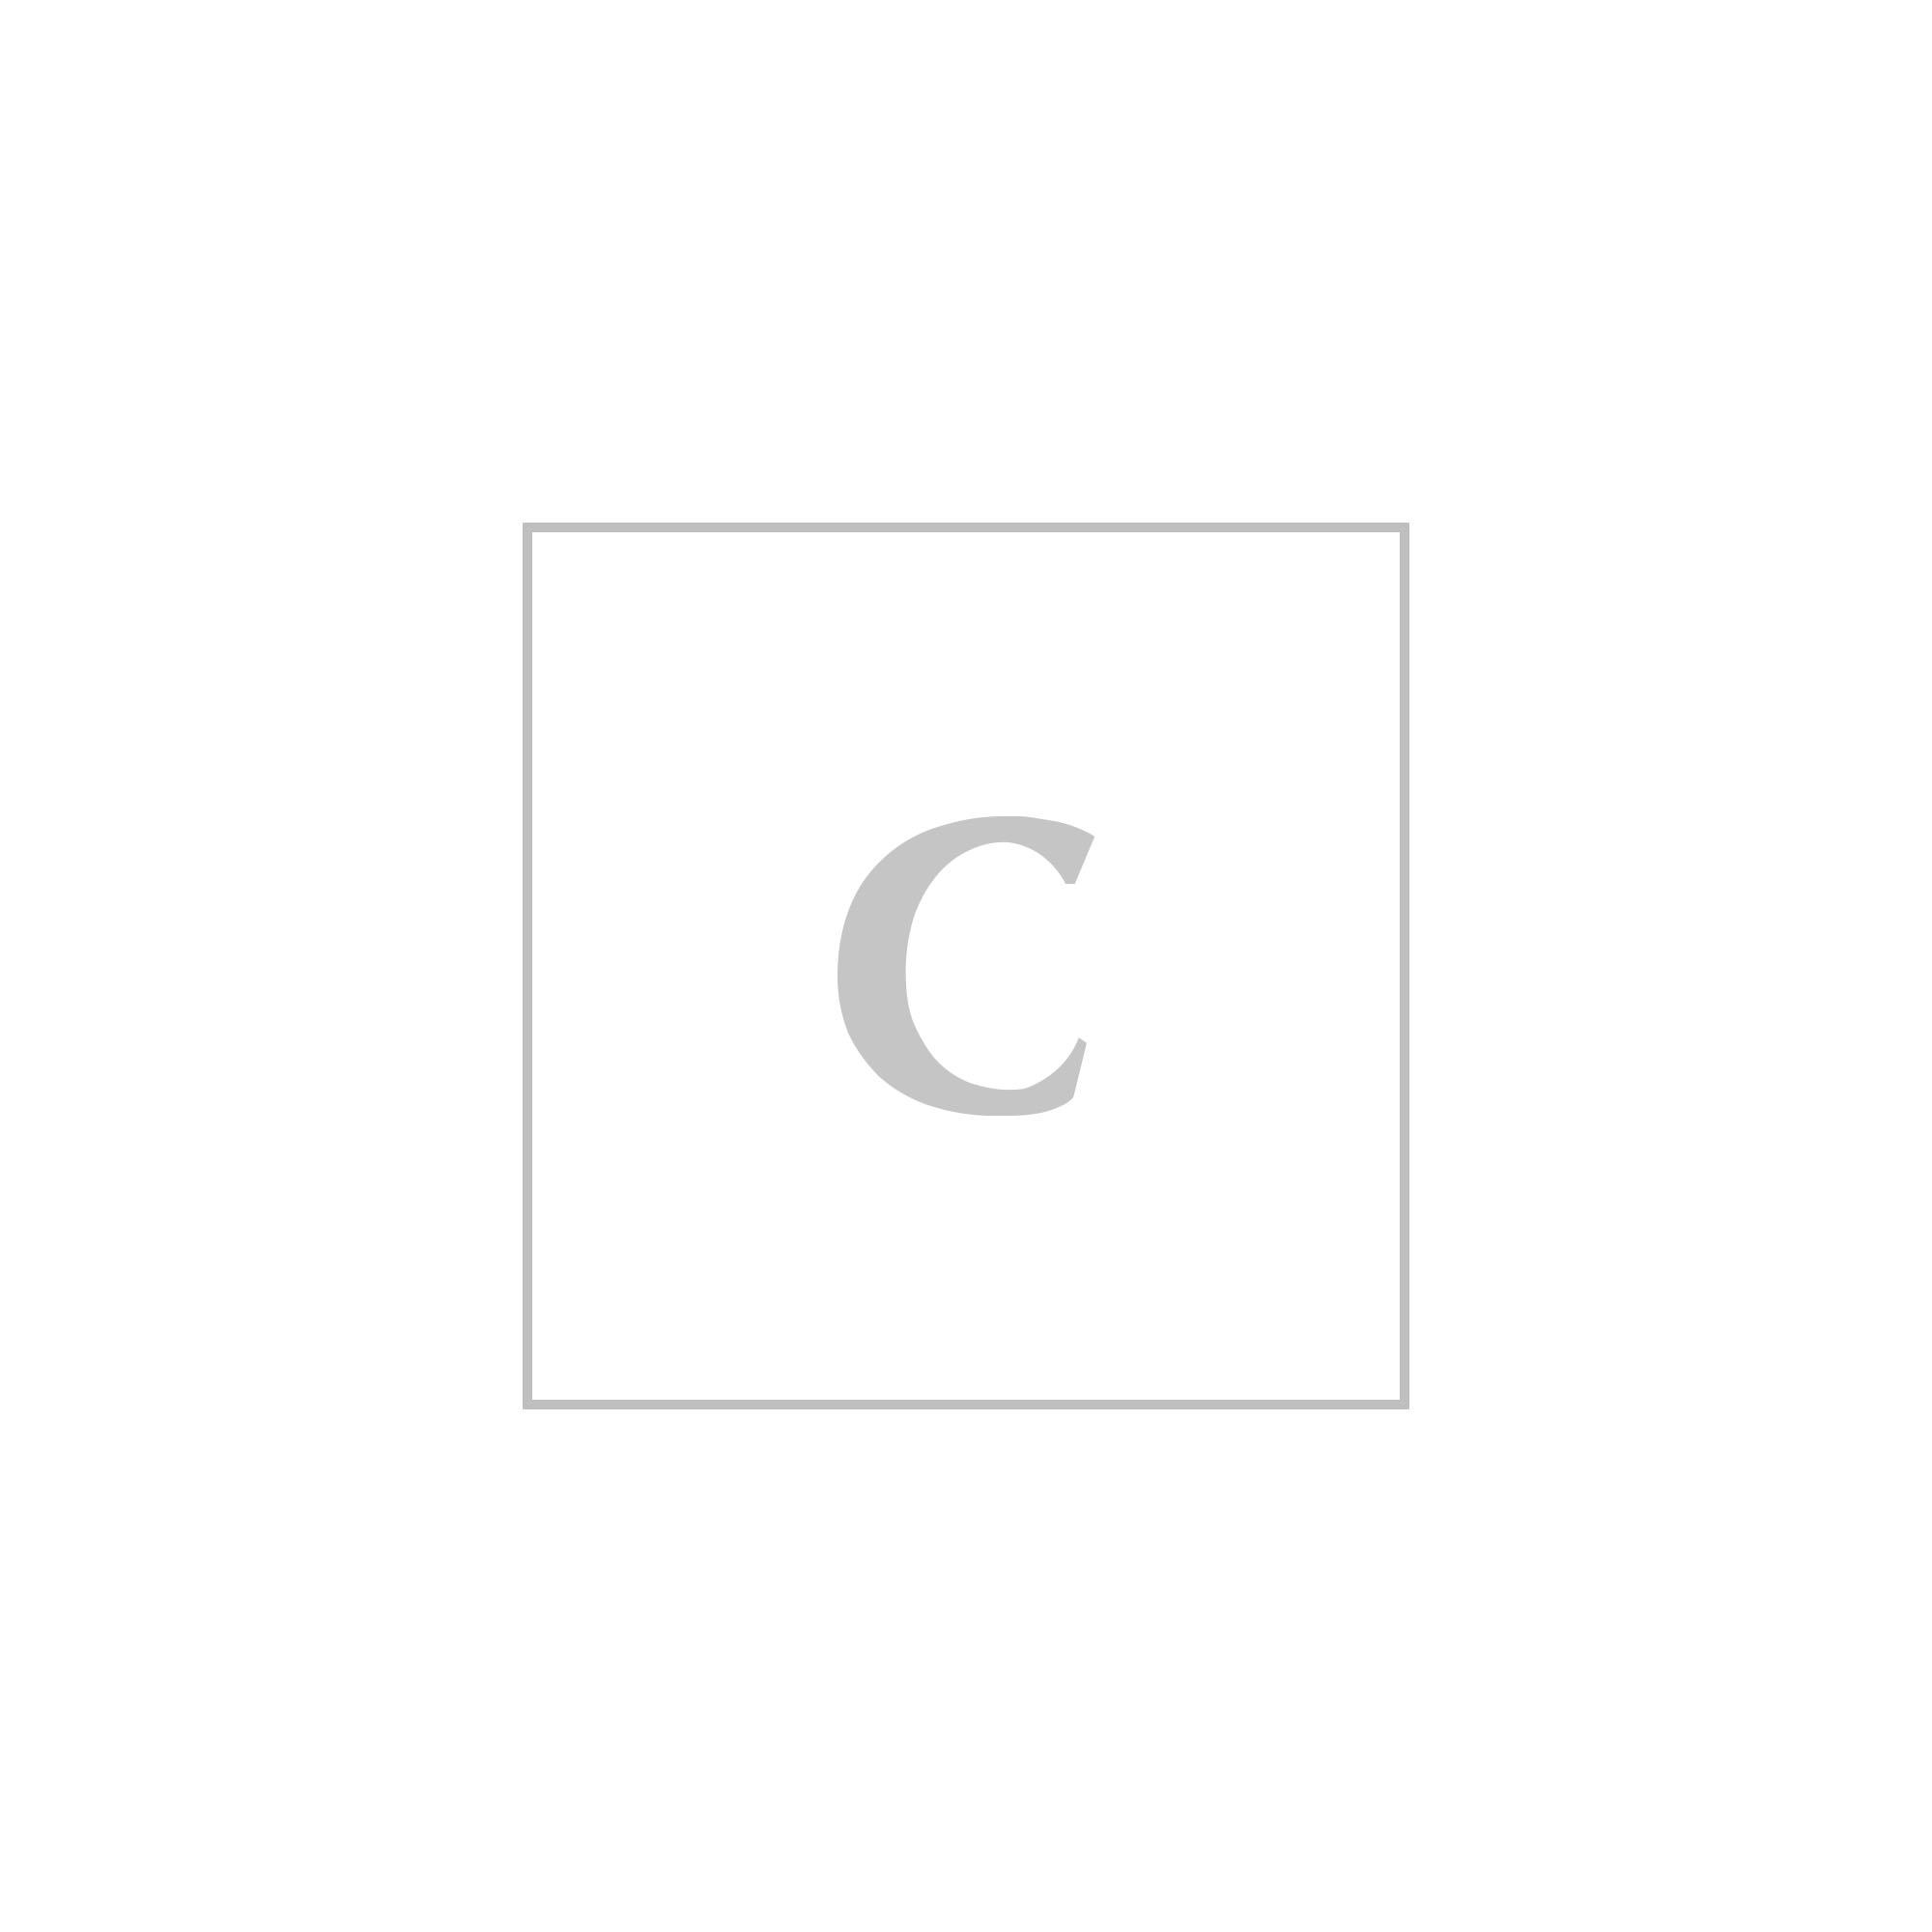 Dolce & gabbana dauphine leather key charm